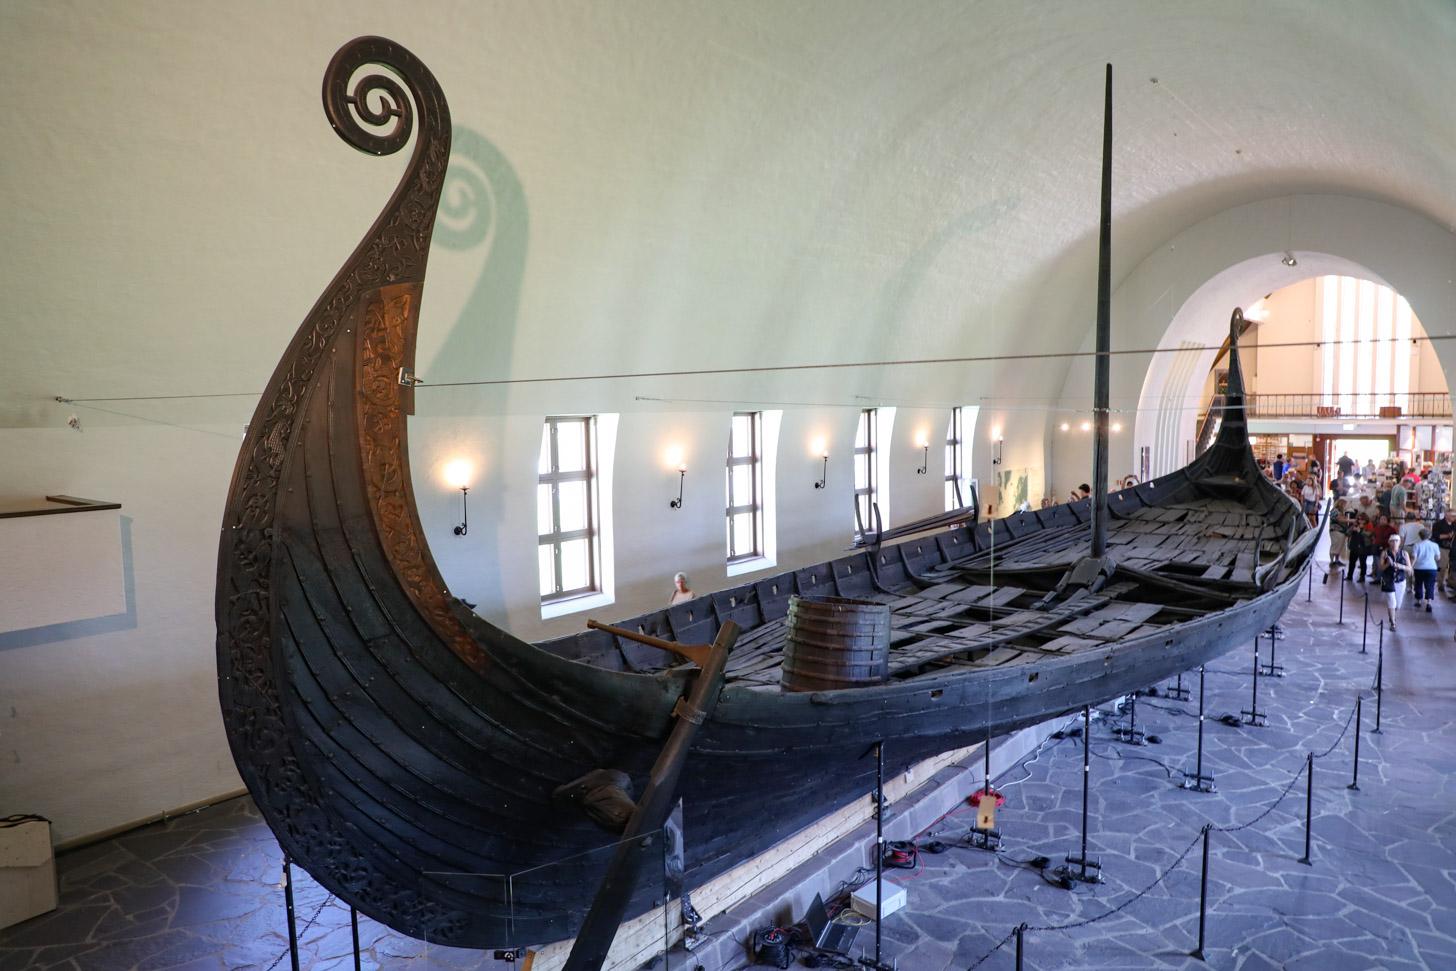 Een ruim duizend jaar oud vikingschip in het Vikingskipshuset